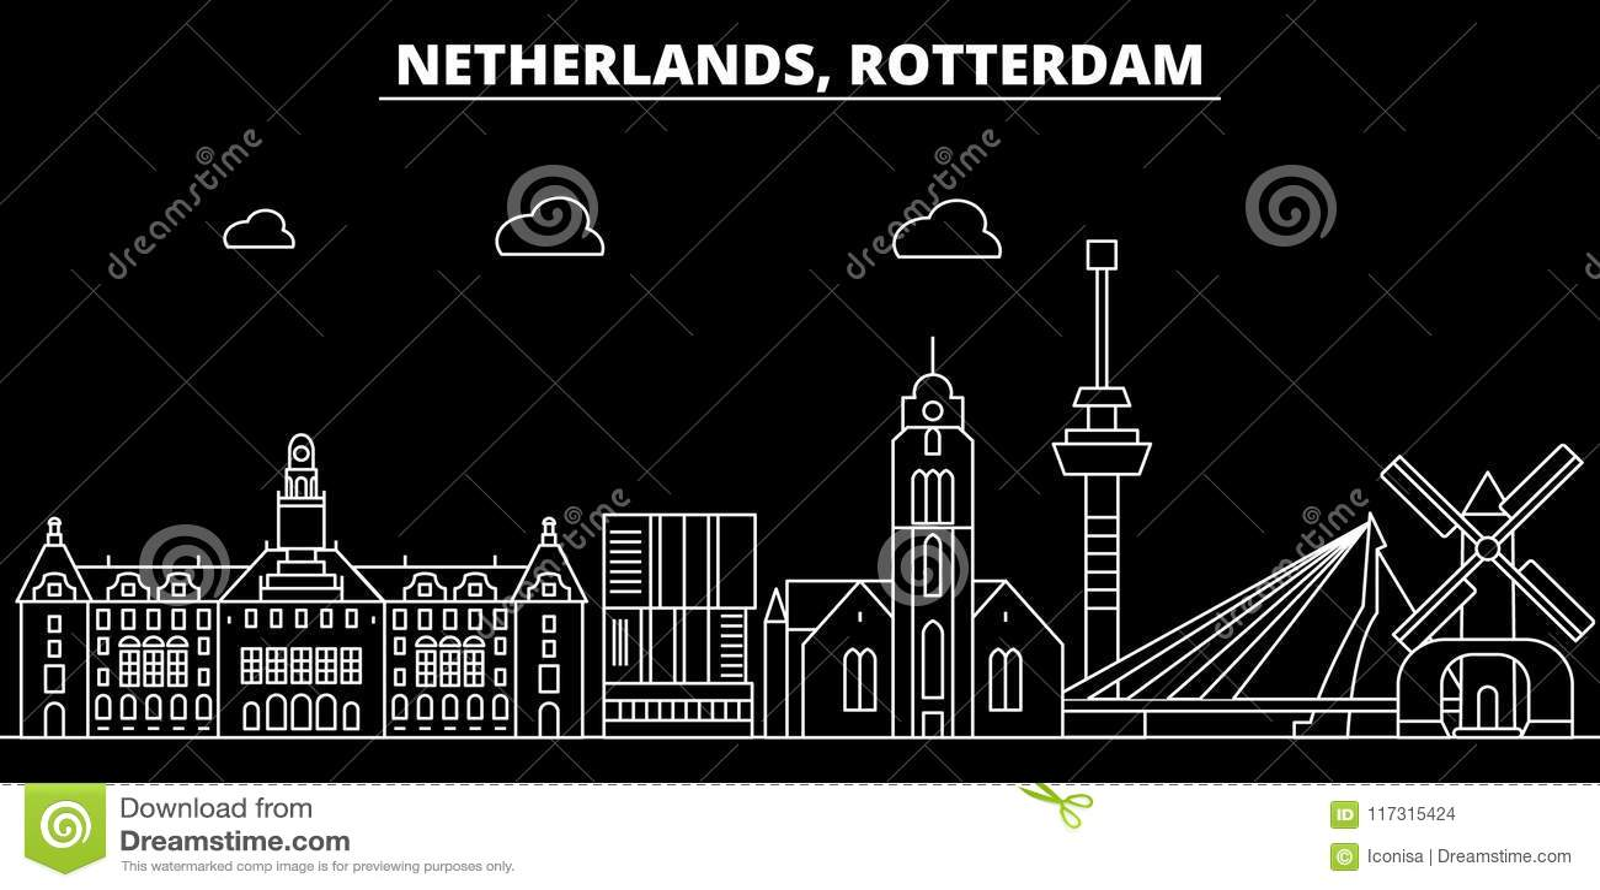 Het silhouethorizon van Rotterdam De vectorstad van Nederland - van Rotterdam, Nederlandse lineaire architectuur, gebouwen rotter